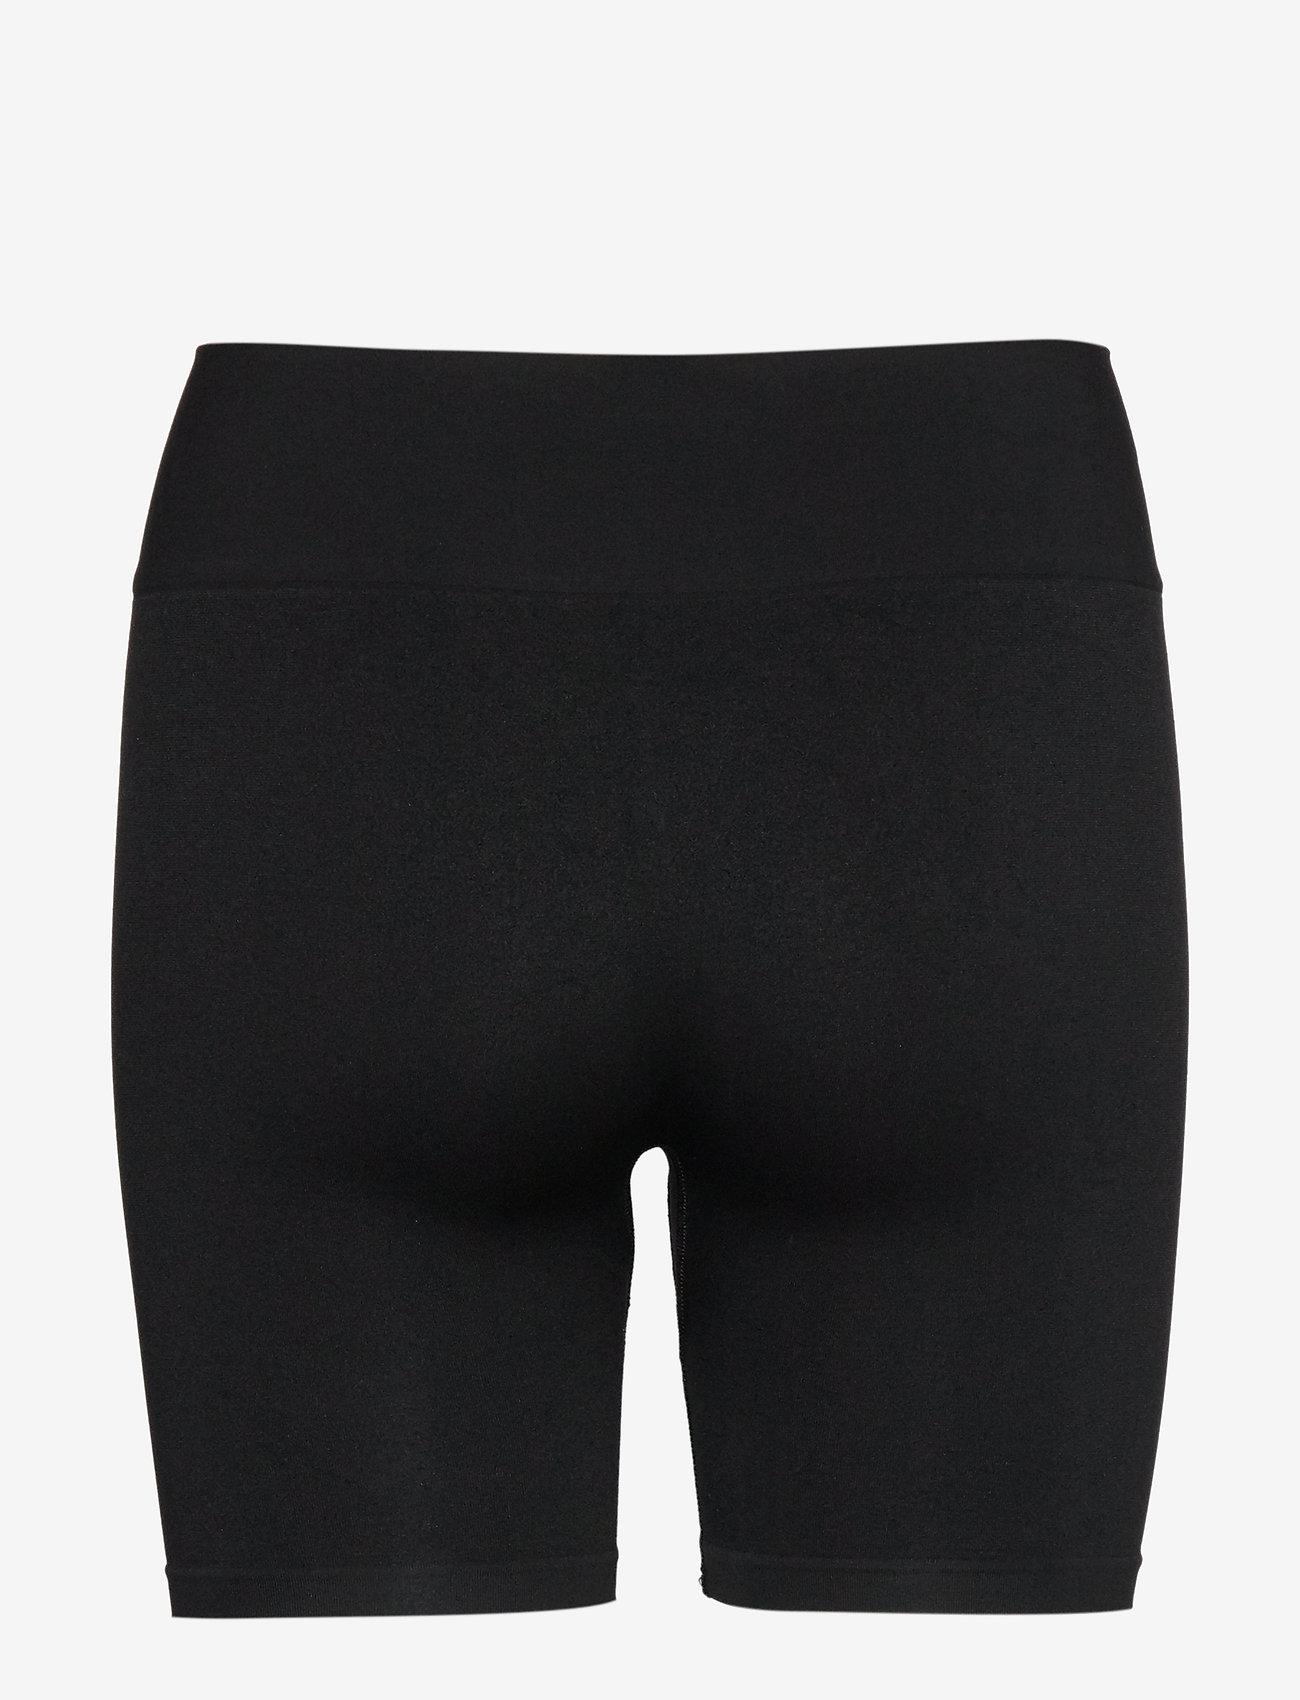 Saint Tropez - T5920, NinnaSZ Microfiber Shorts - fietsbroeken - black - 1